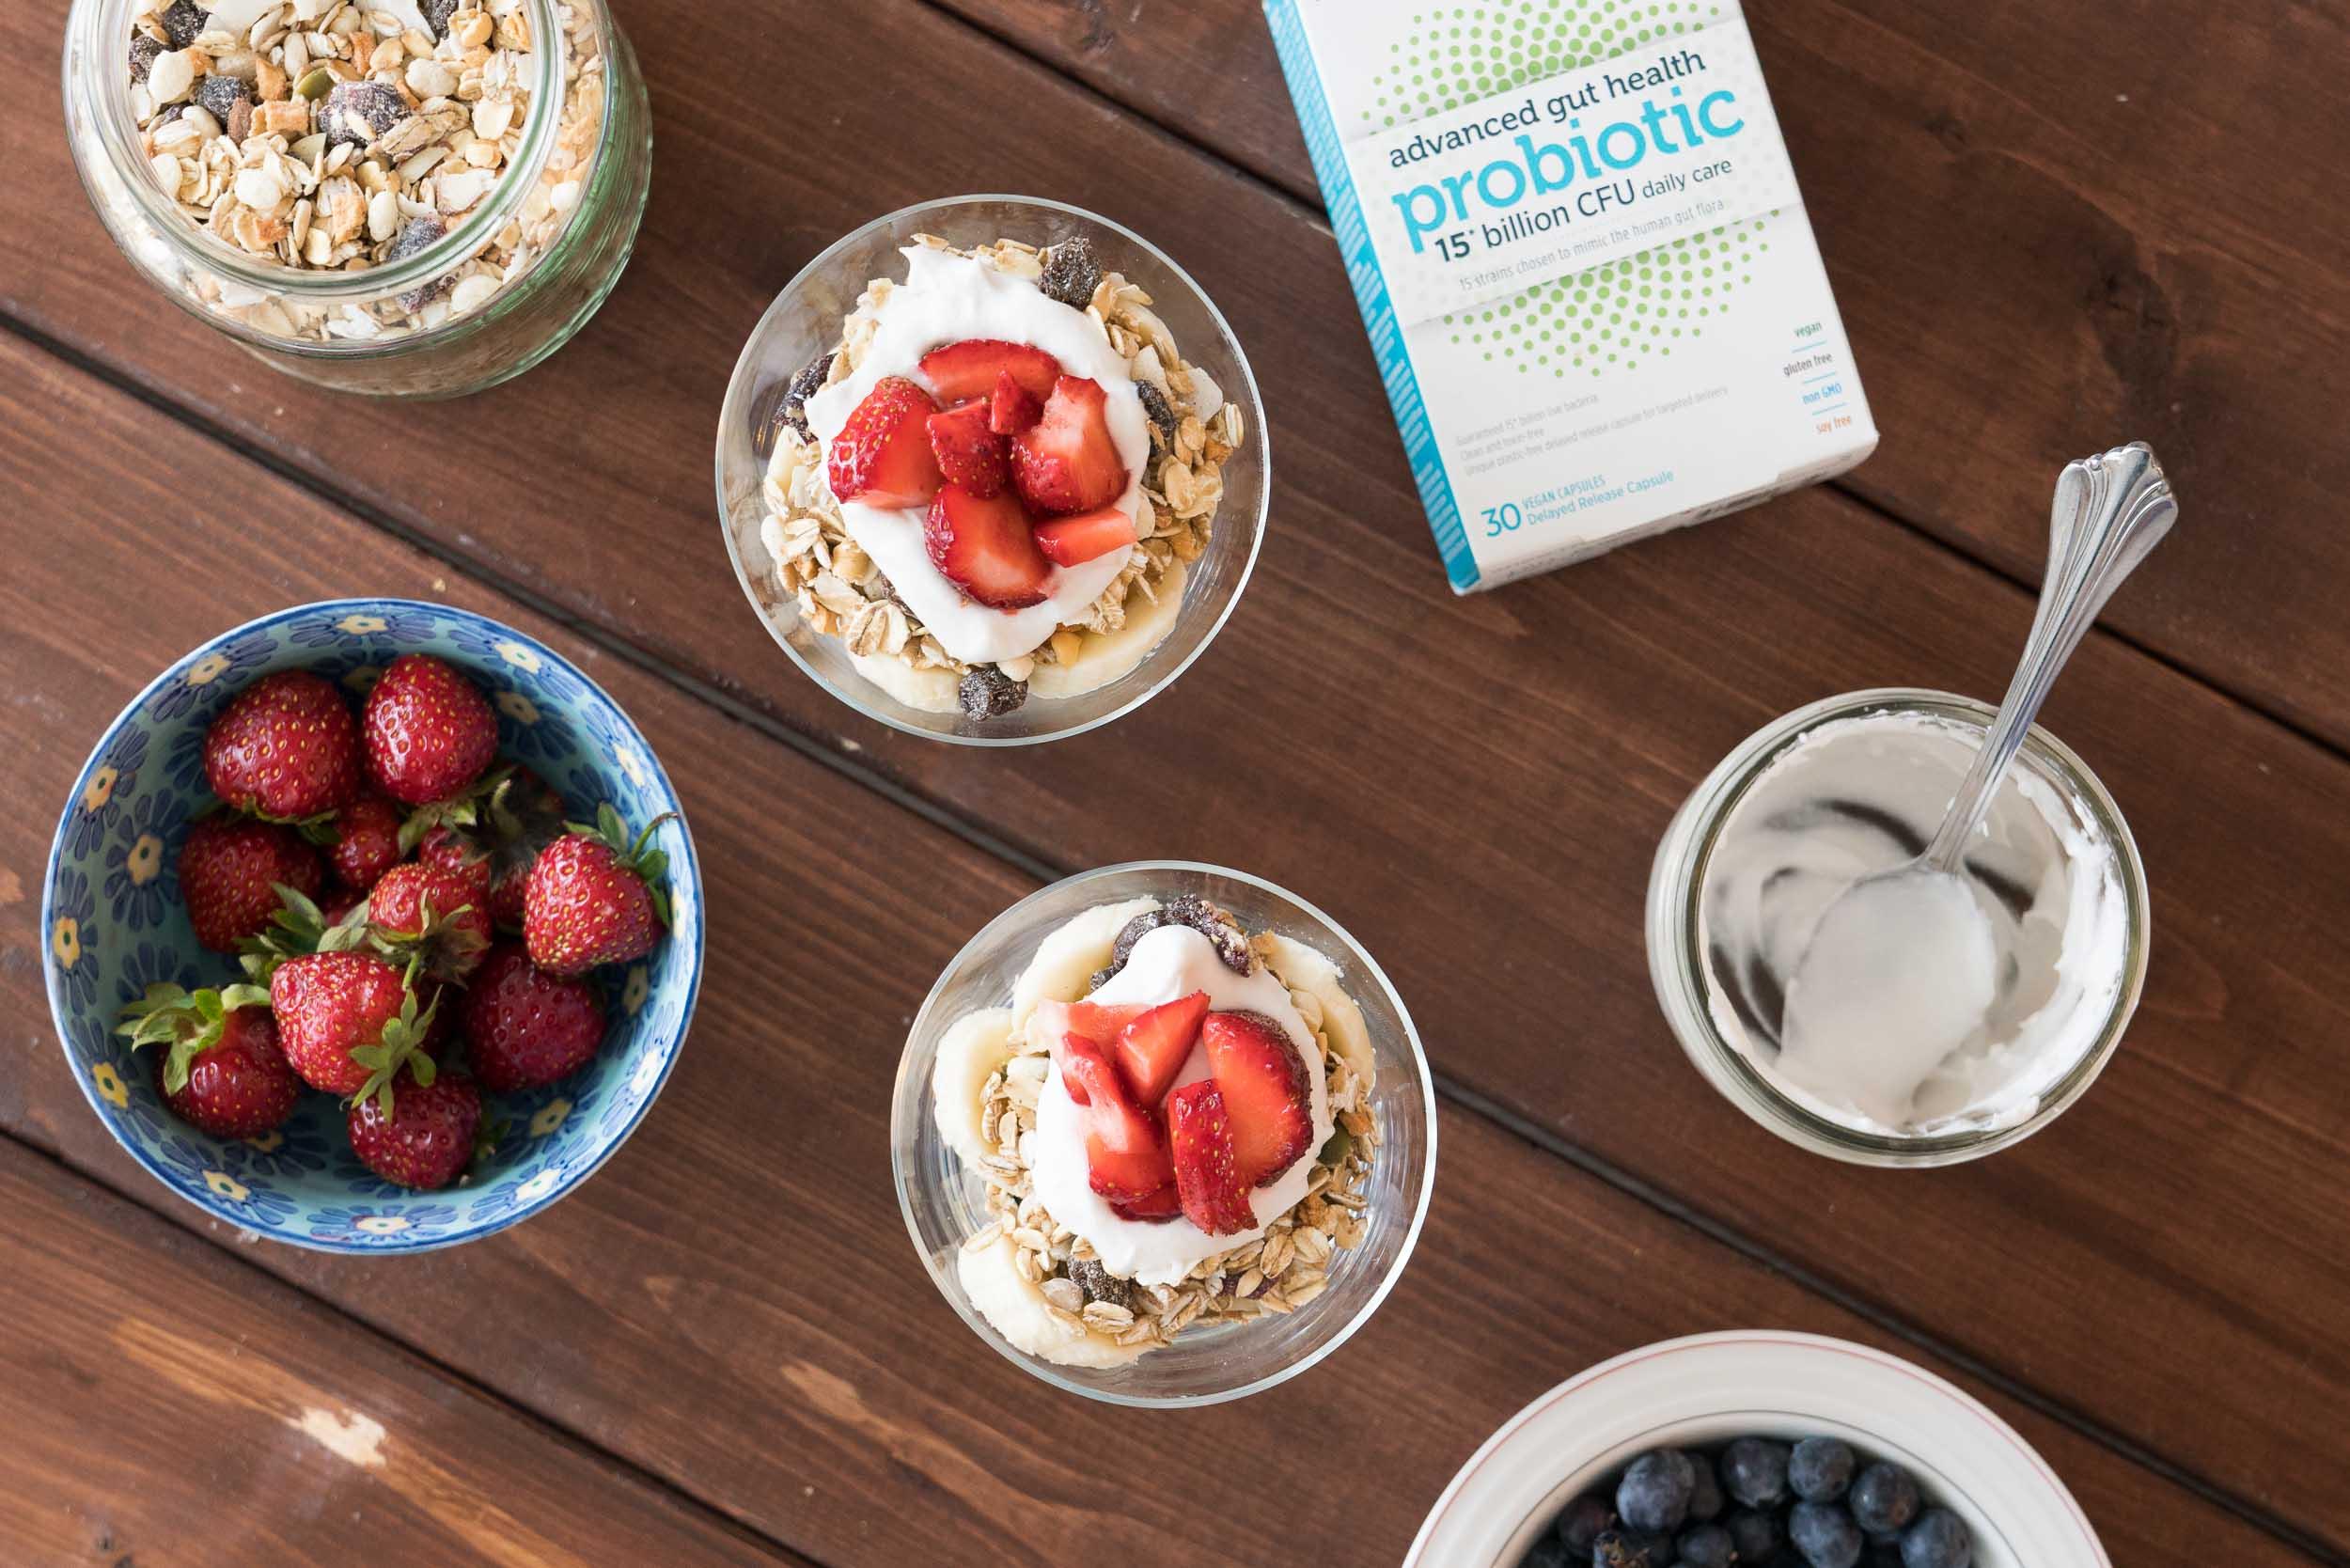 How to Make Homemade Coconut Milk Yogurt • Joyous Health